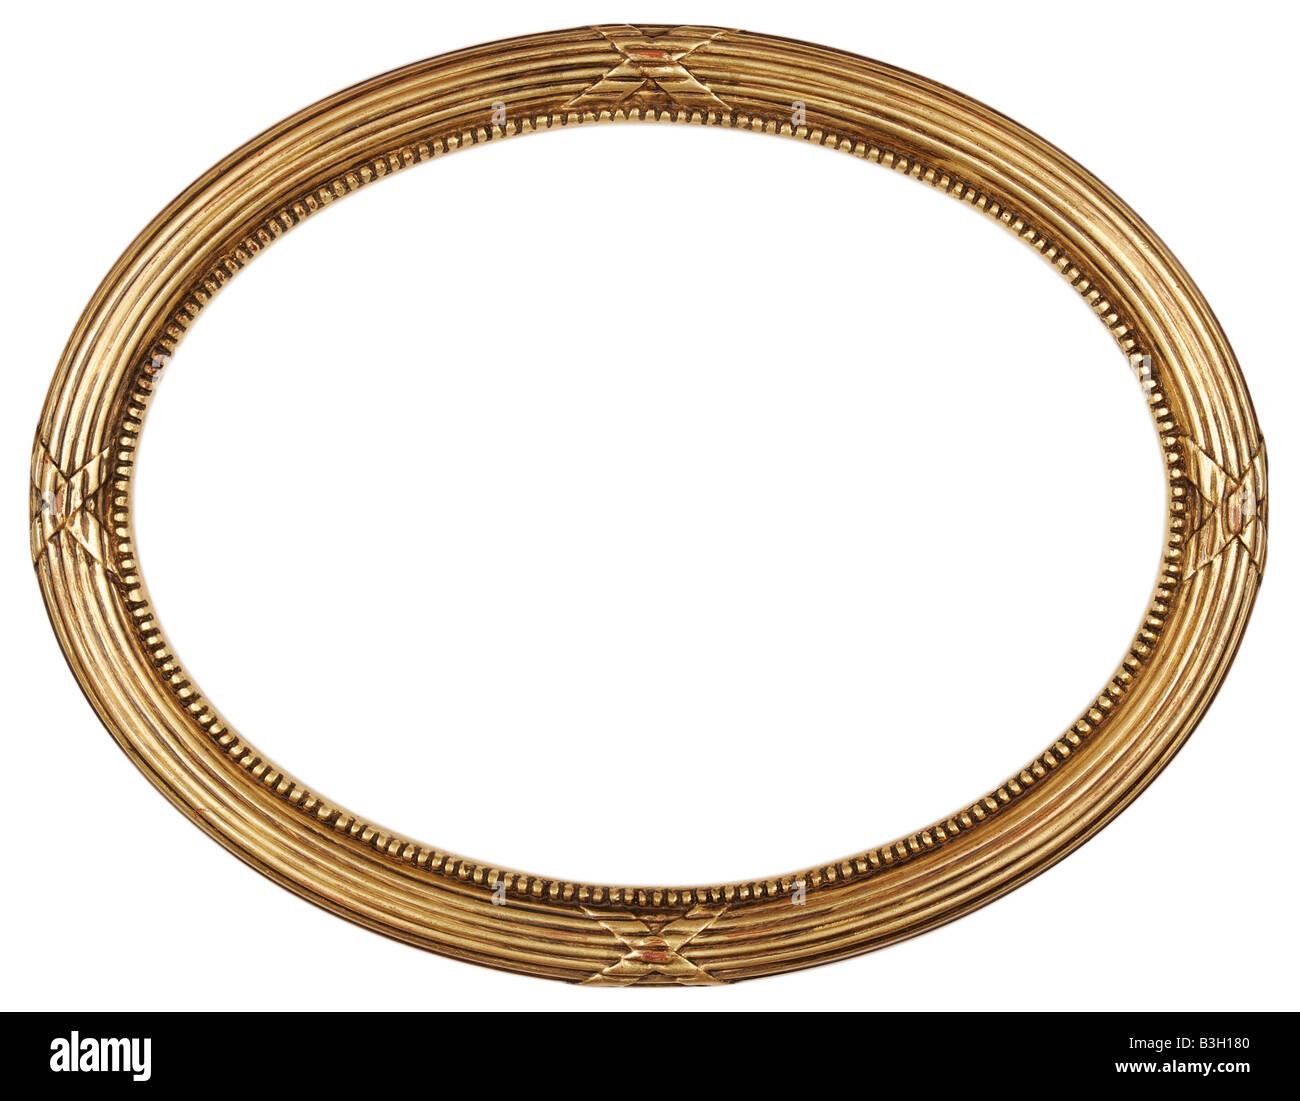 Reiches gold Oval Antik Bild Frame Ausschnitt Kunsthandwerk Stockbild